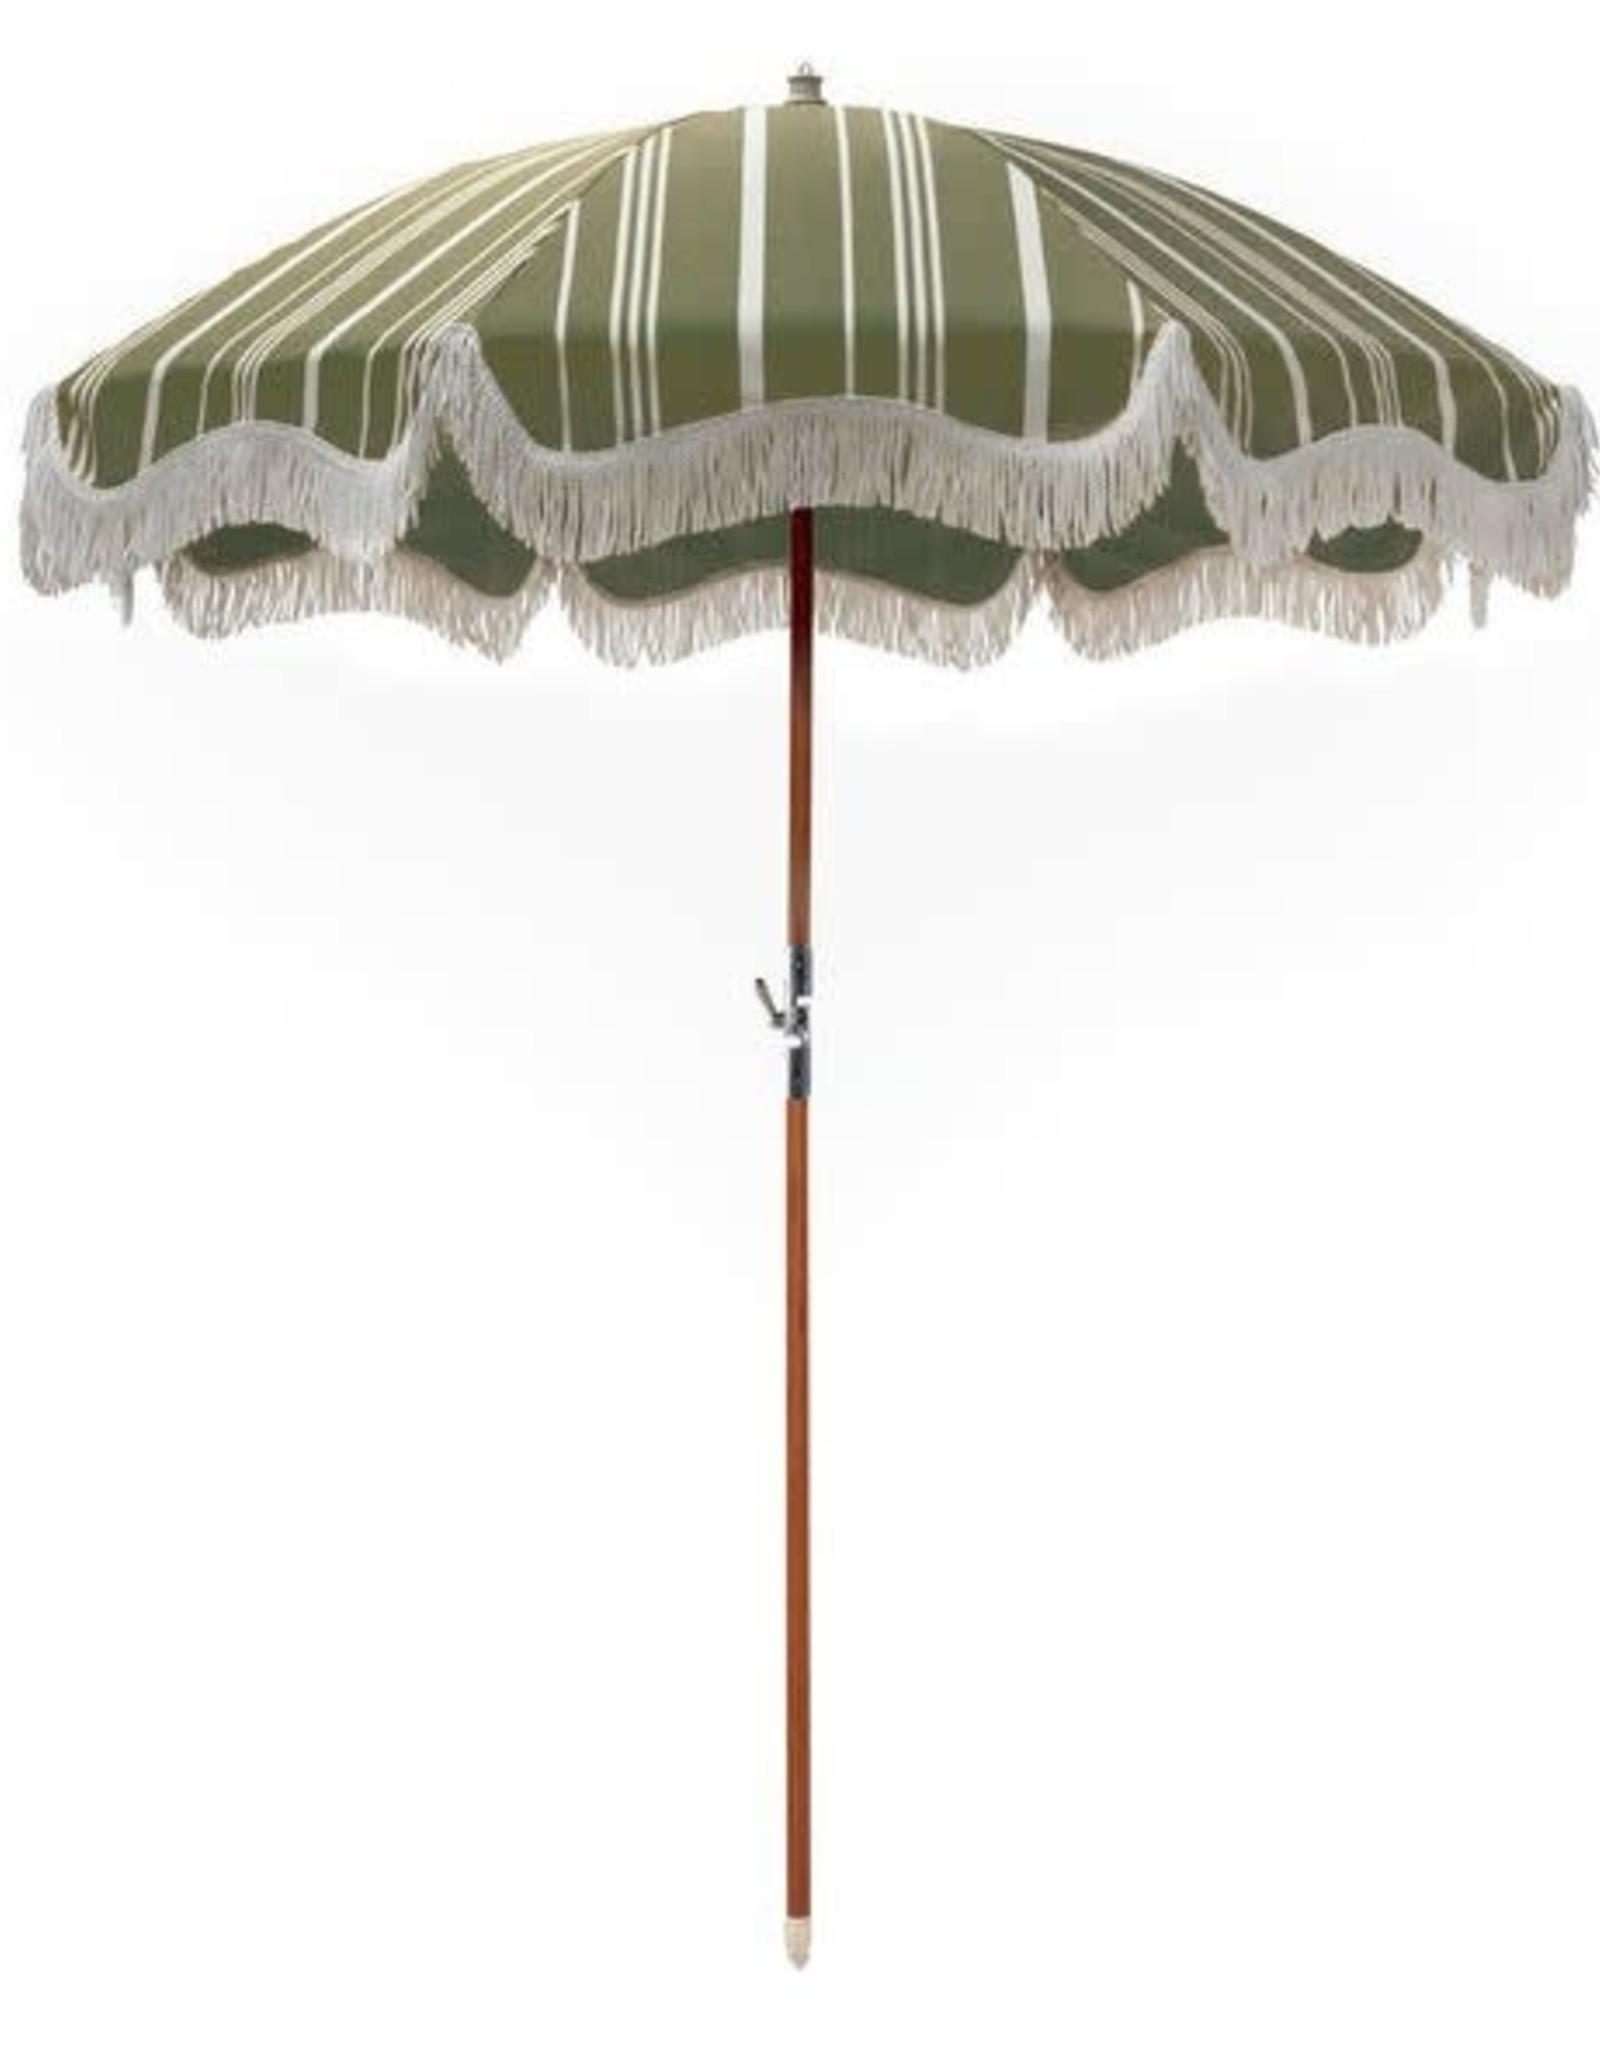 Home Premium Beach Umbrella - Vintage Green Stripe